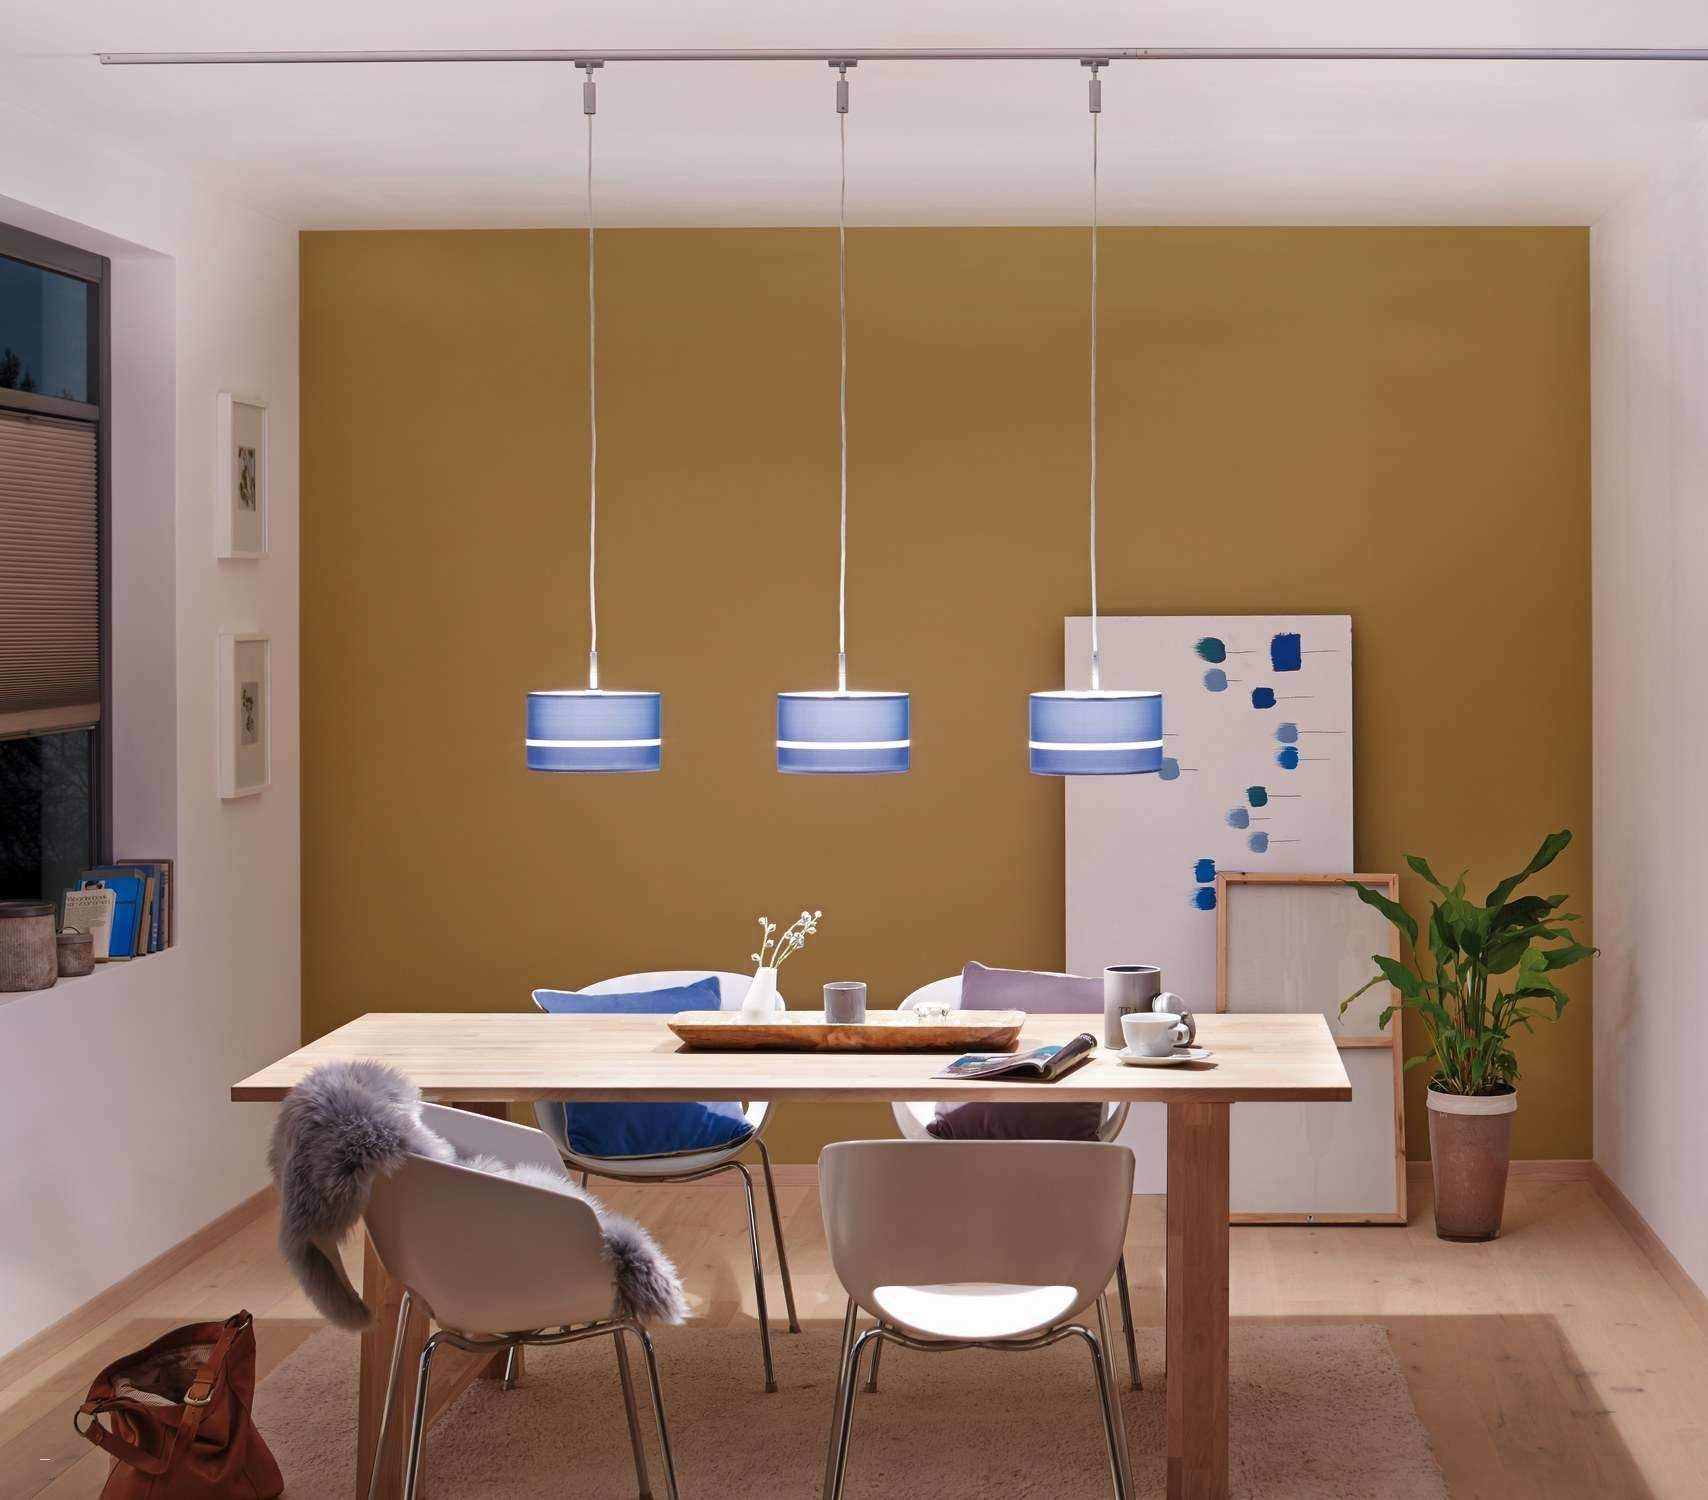 Full Size of Deckenlampe Schlafzimmer Lampe Design Led Deckenleuchte Pinterest Holz Dimmbar E27 Modern Skandinavisch Wohnzimmer Einzigartig Neu Weiss Komplett Mit Schlafzimmer Deckenlampe Schlafzimmer